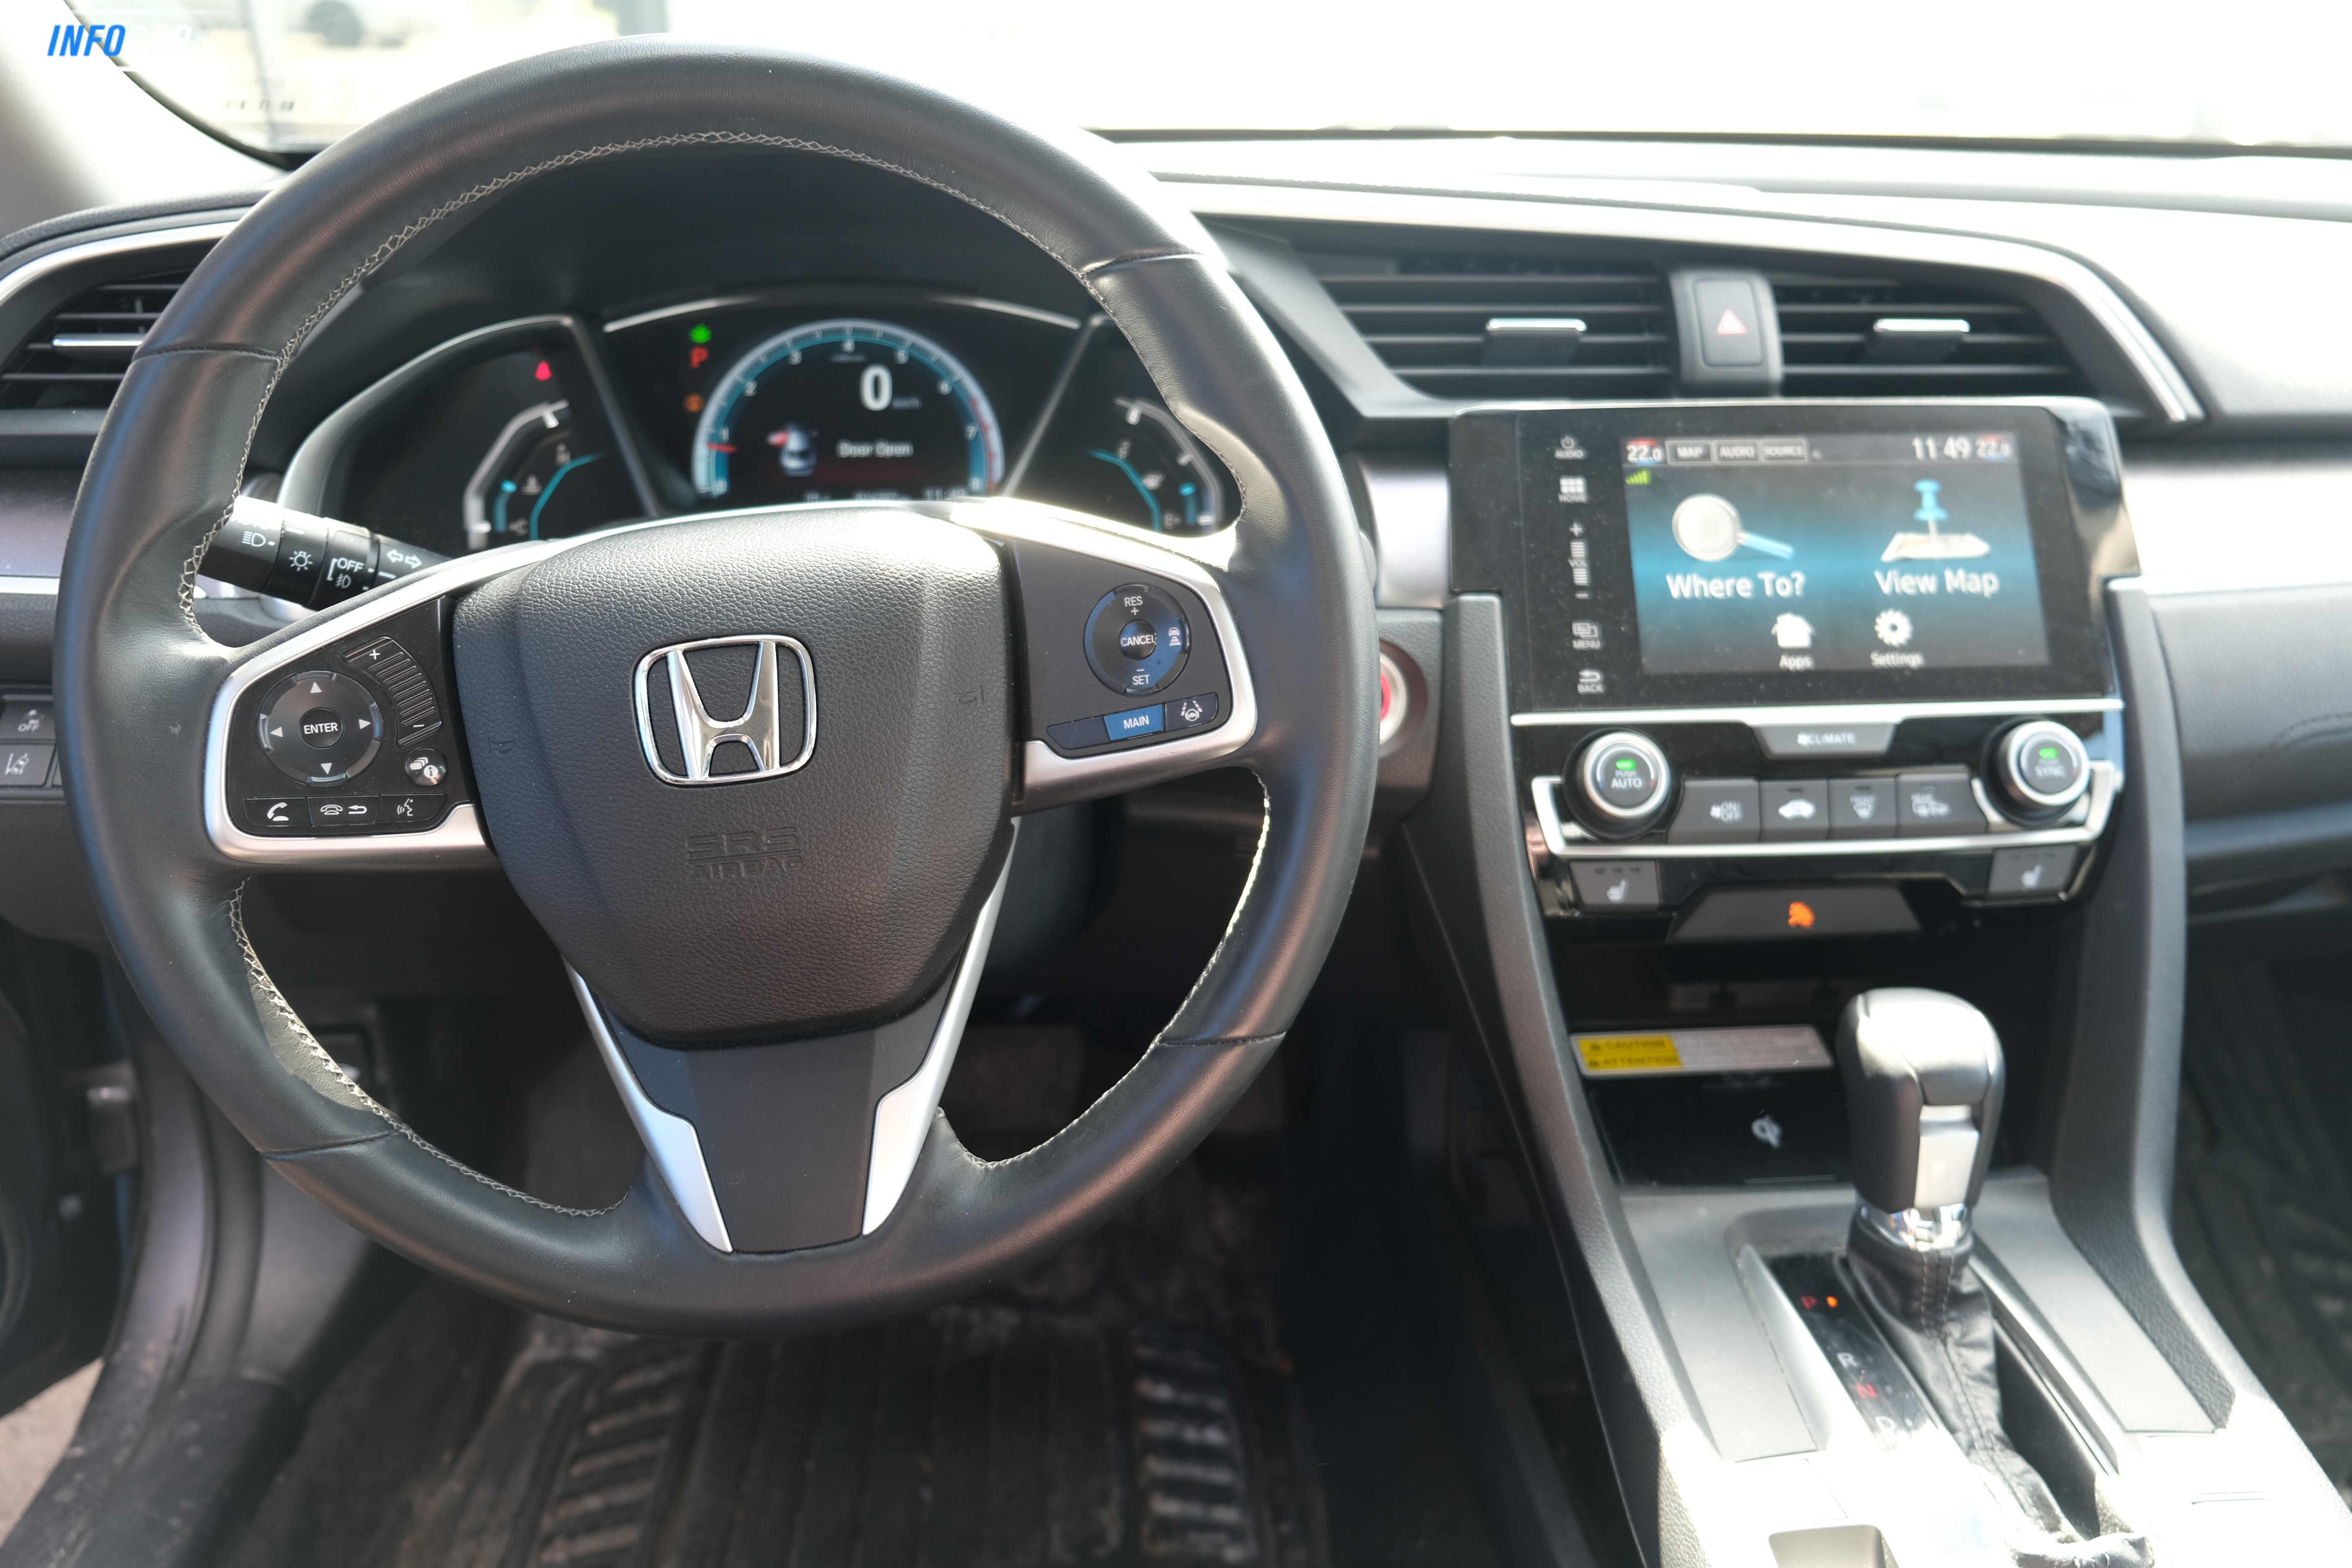 2018 Honda Civic TOURING - INFOCAR - Toronto's Most Comprehensive New and Used Auto Trading Platform